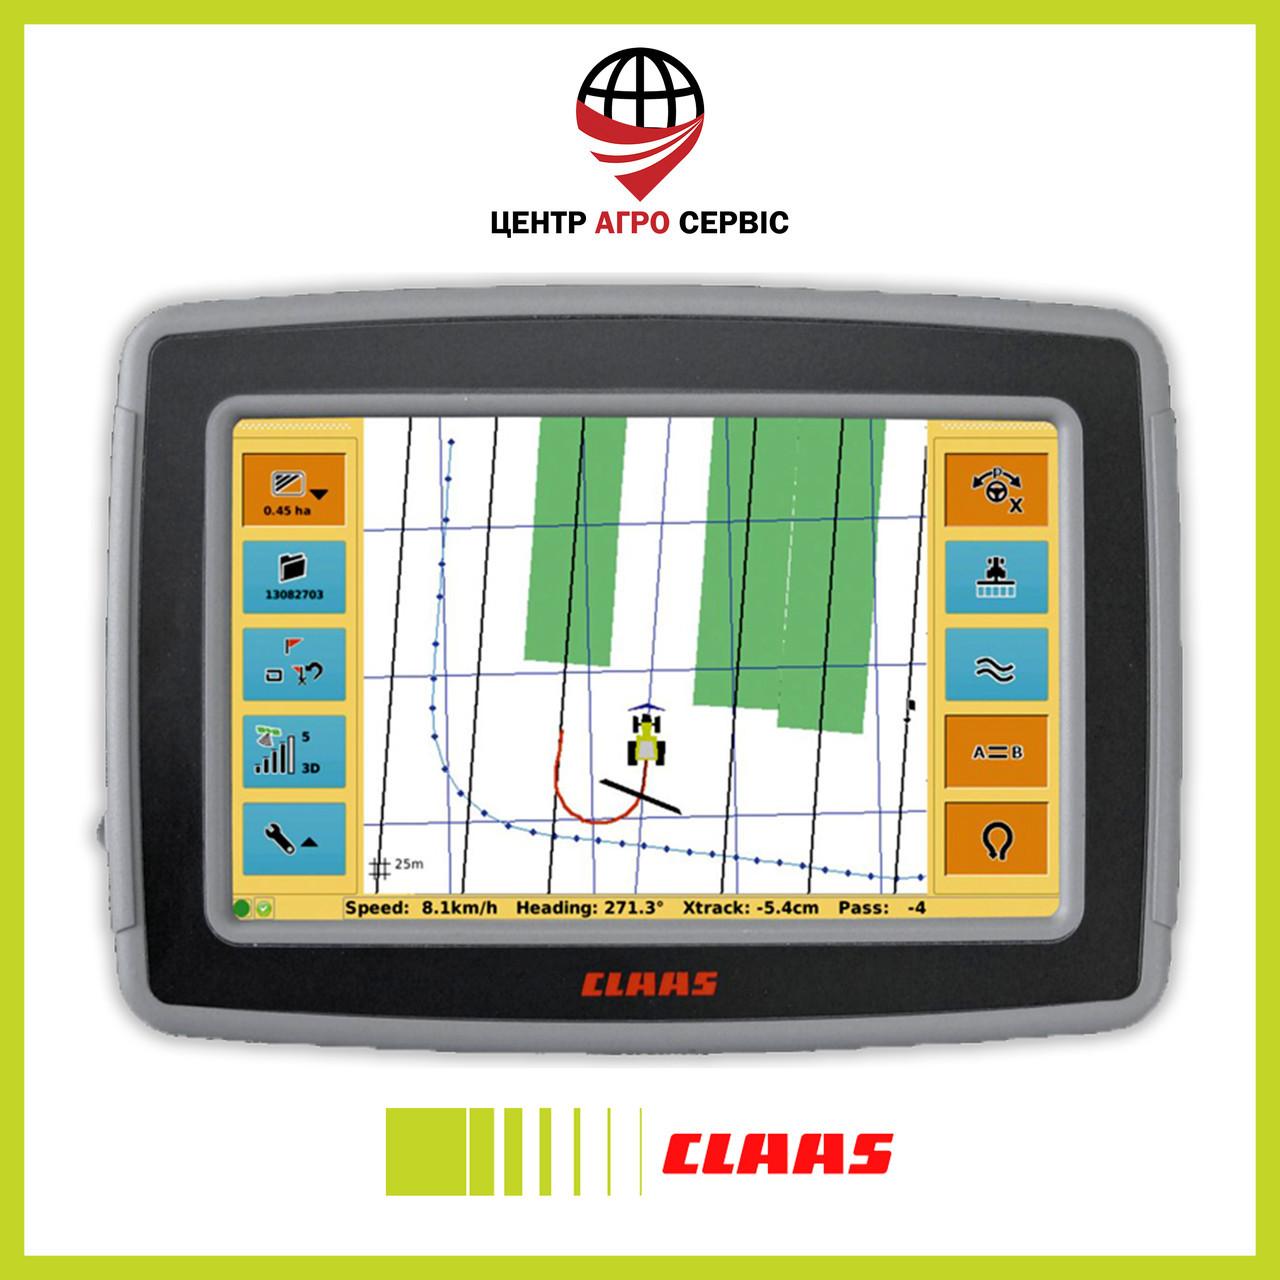 Gps навигатор для трактора (навигатор для поля, сельхоз навигатор)  CLAAS gps copilot s7